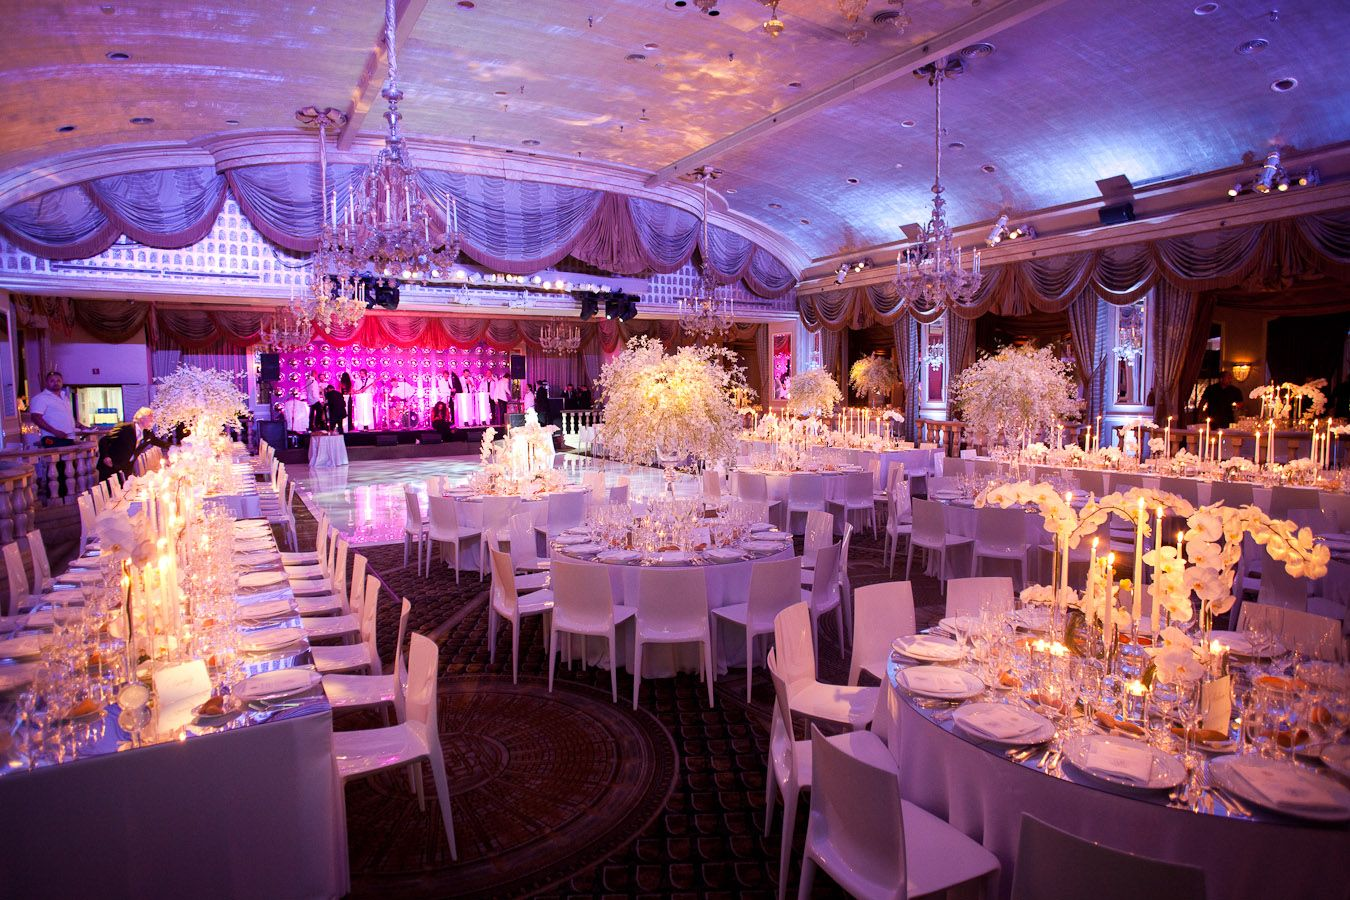 white wedding decor | 11.30.13 | Pinterest | Flower decoration ...